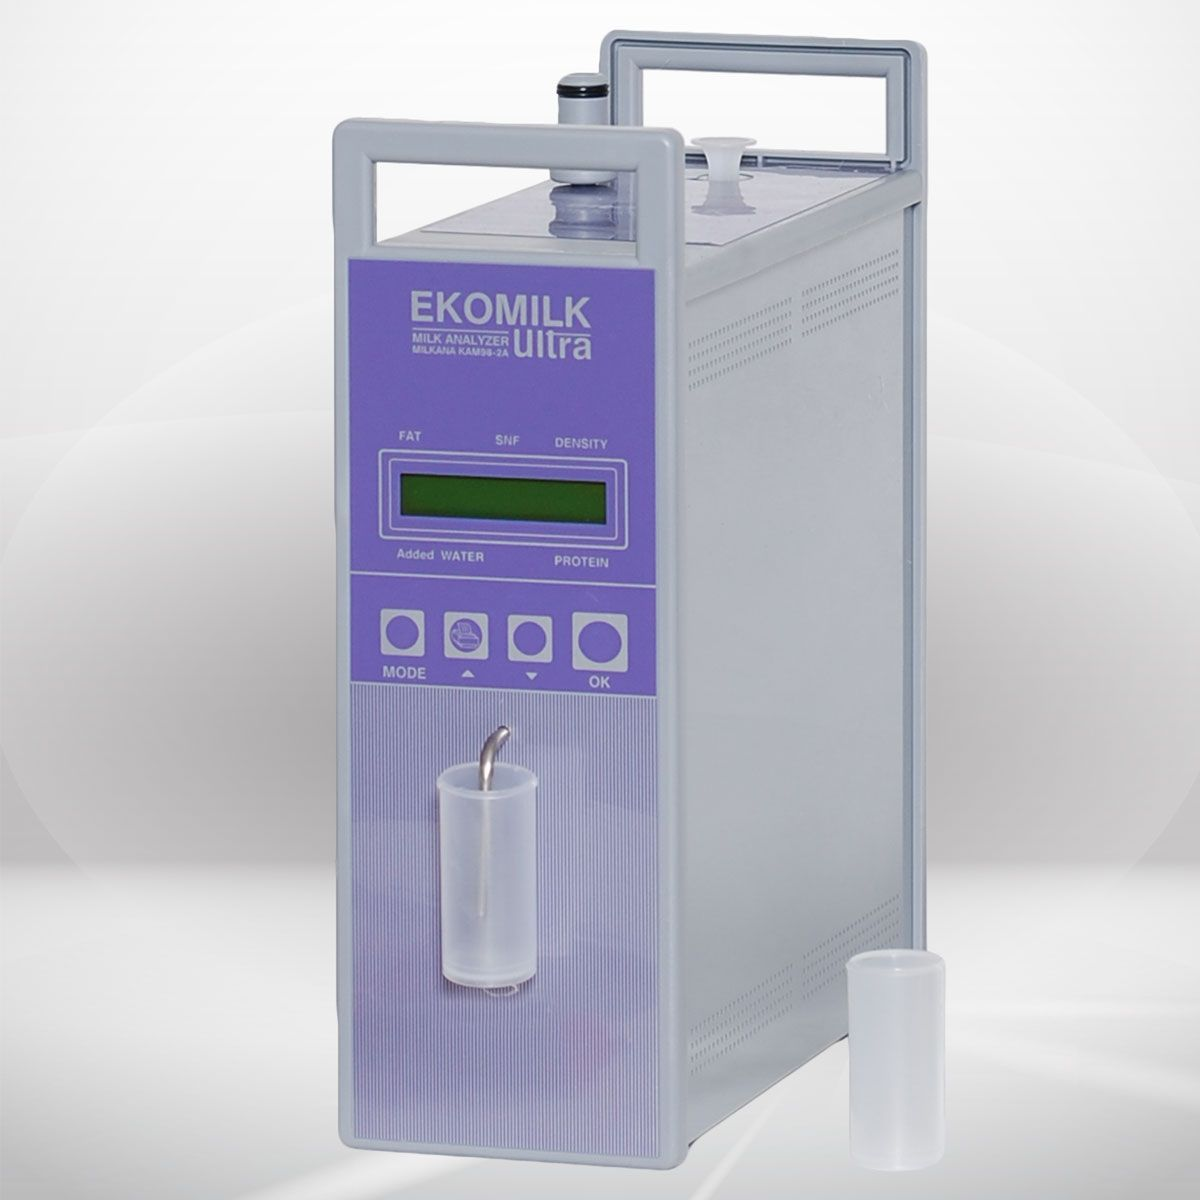 Máy phân tích sữa 40 giây, model: Ekomilk ULTRA